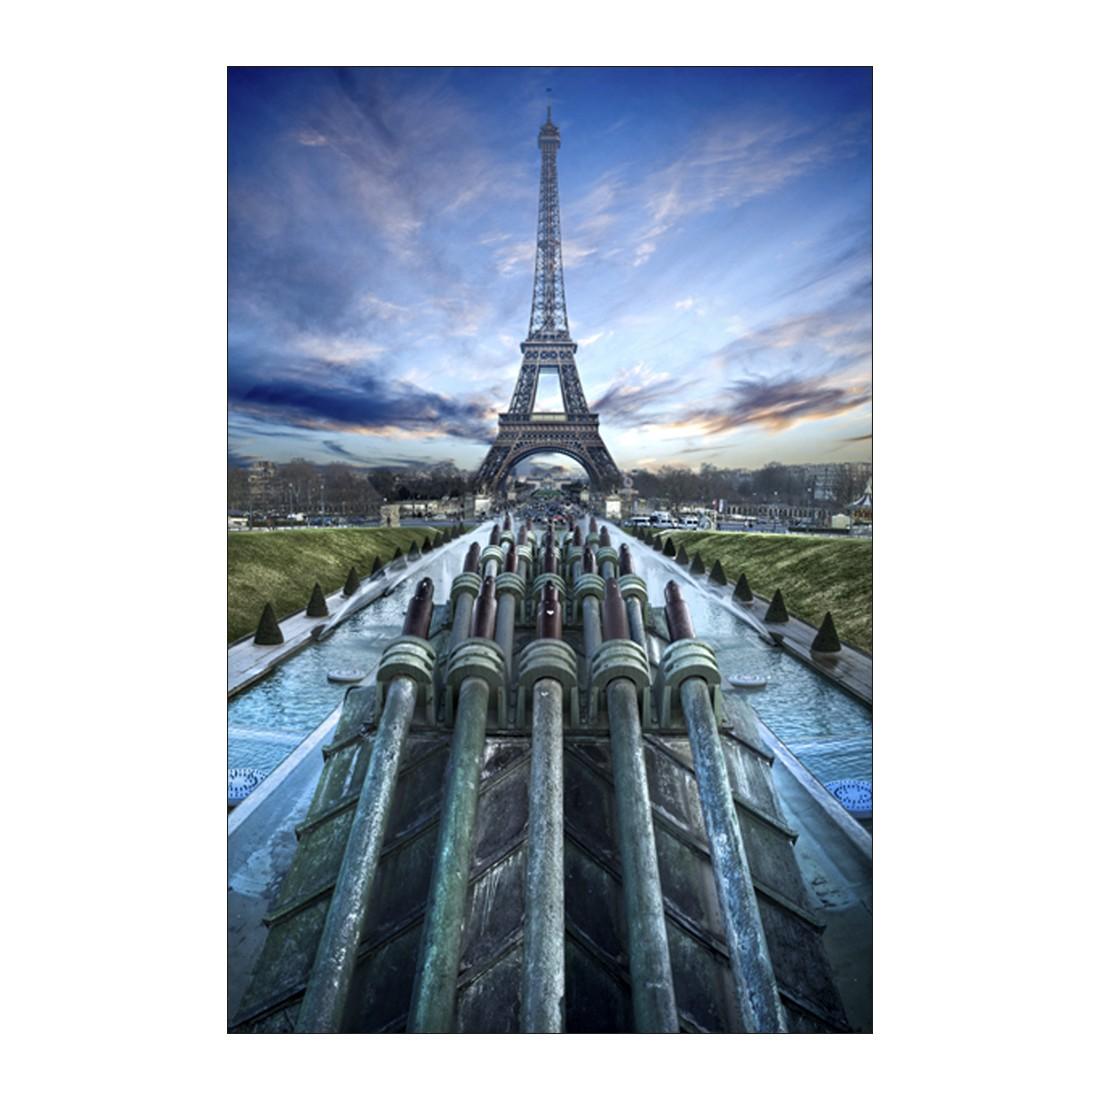 Leinwandbild EIFFEL TOWER IN FOCUS – Abmessung 75 x 100 cm, Gallery of Innovative Art jetzt bestellen